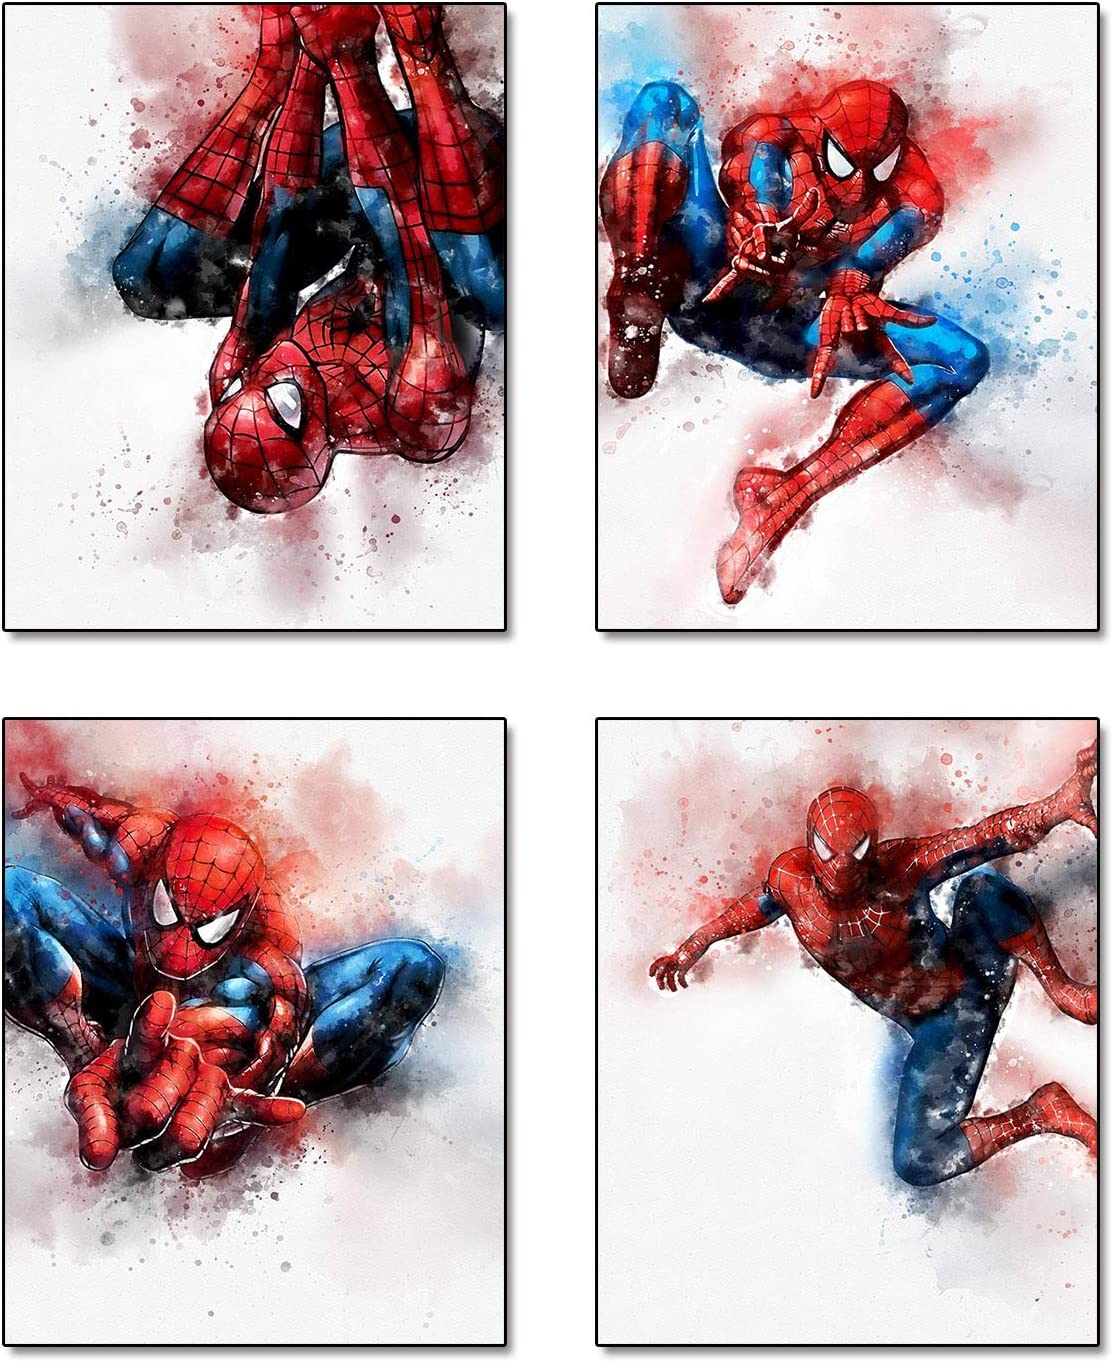 "Cartoons Superhero Spiderman Theme Art Painting Set of 4 (8""X10"" Canvas Picture) Children Kids Boys Birthday Gift Game Room Decor Art Prints Nursery Wall Poster Home Decor Unframed"